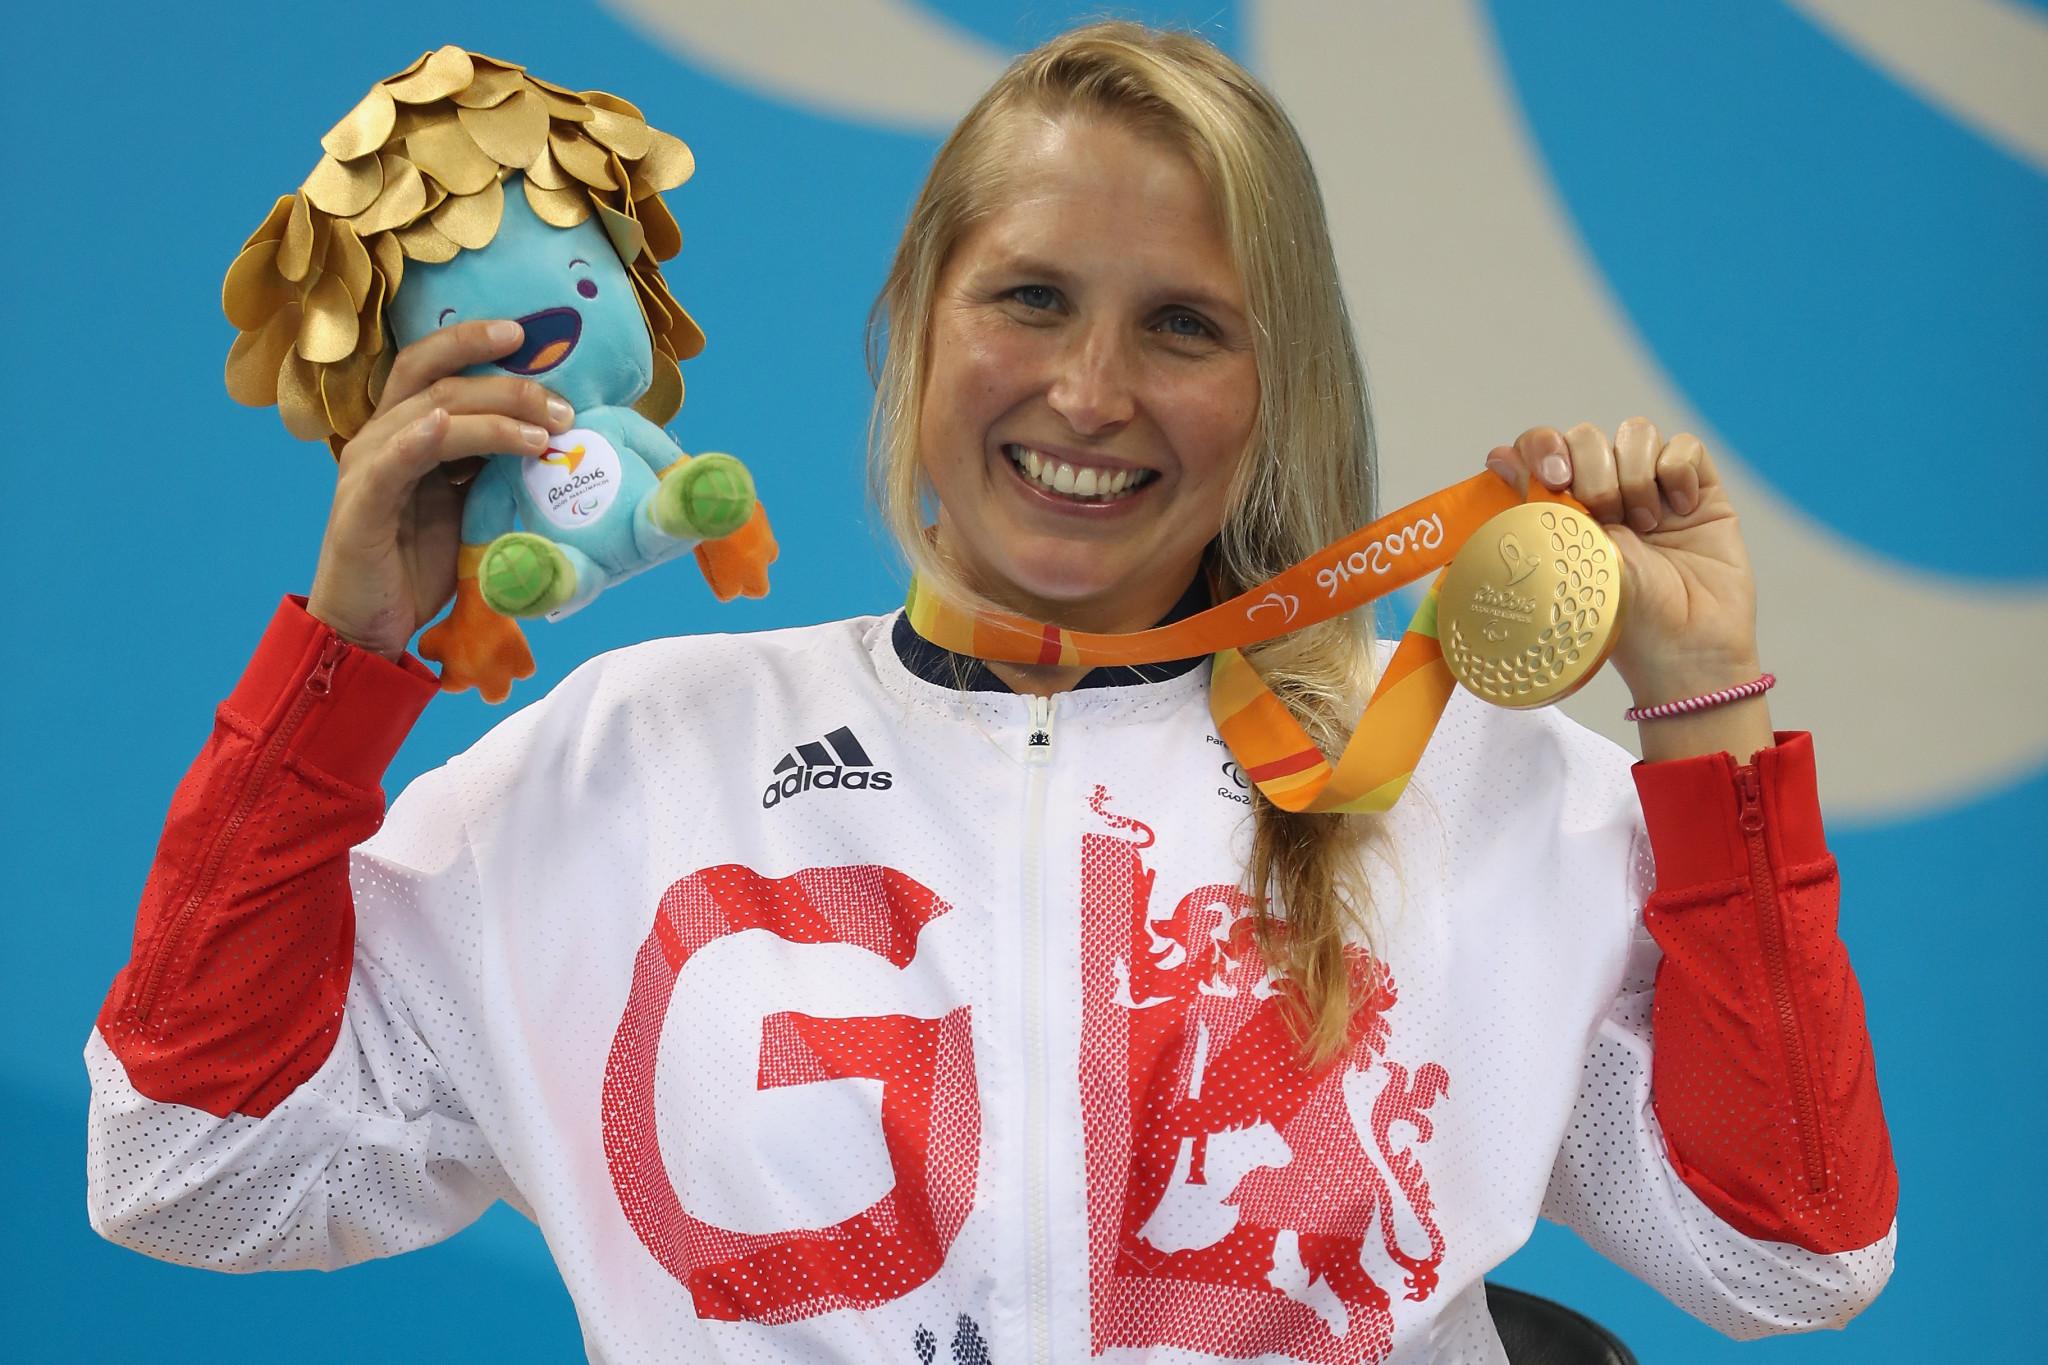 Double Paralympic champion Millward announces retirement after Tokyo 2020